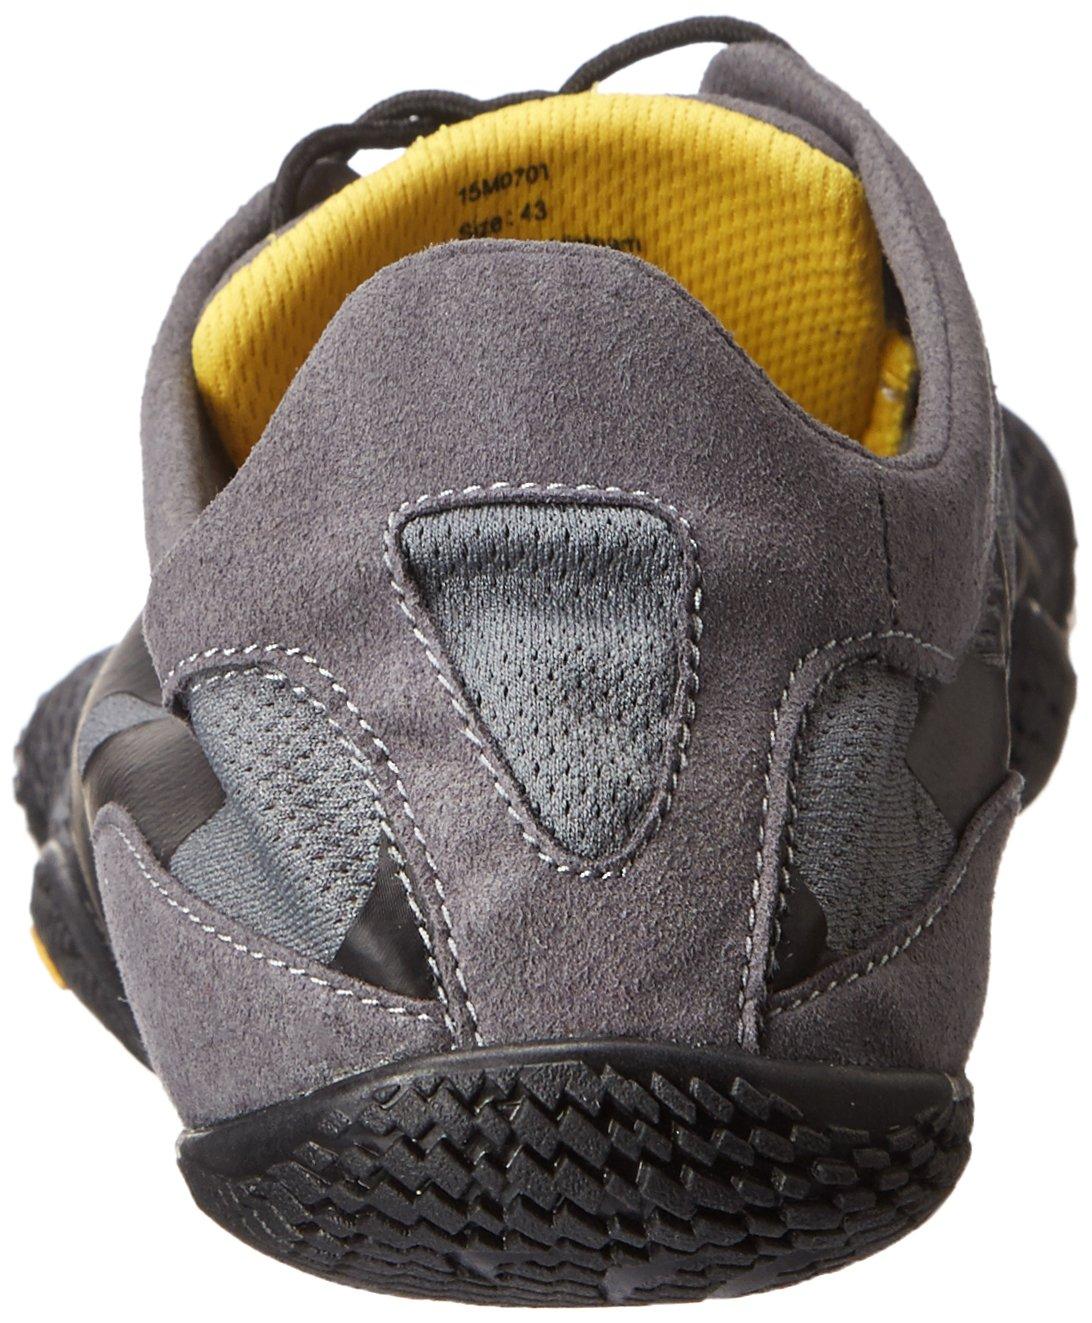 Vibram Men's KSO EVO Cross Training Shoe,Grey/Black,41 EU/8.5-9.0 M US by Vibram (Image #2)